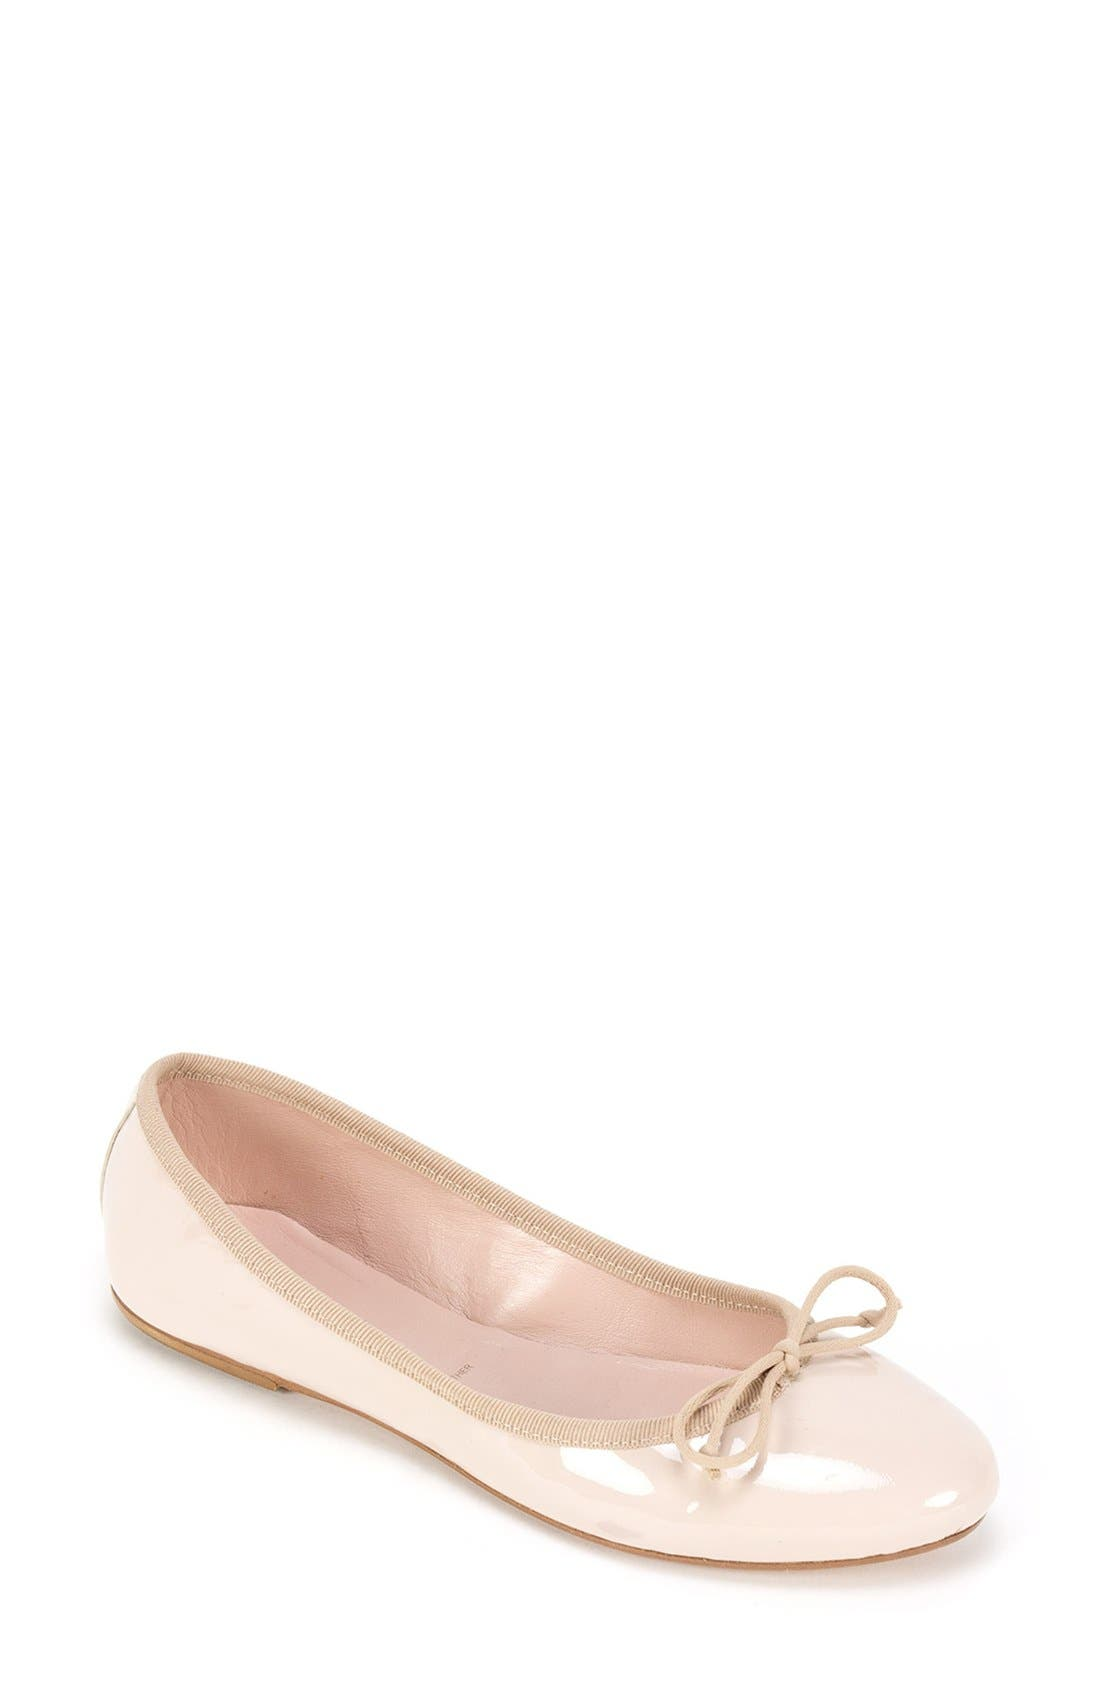 'Kendall' Ballet Flat,                             Main thumbnail 1, color,                             251